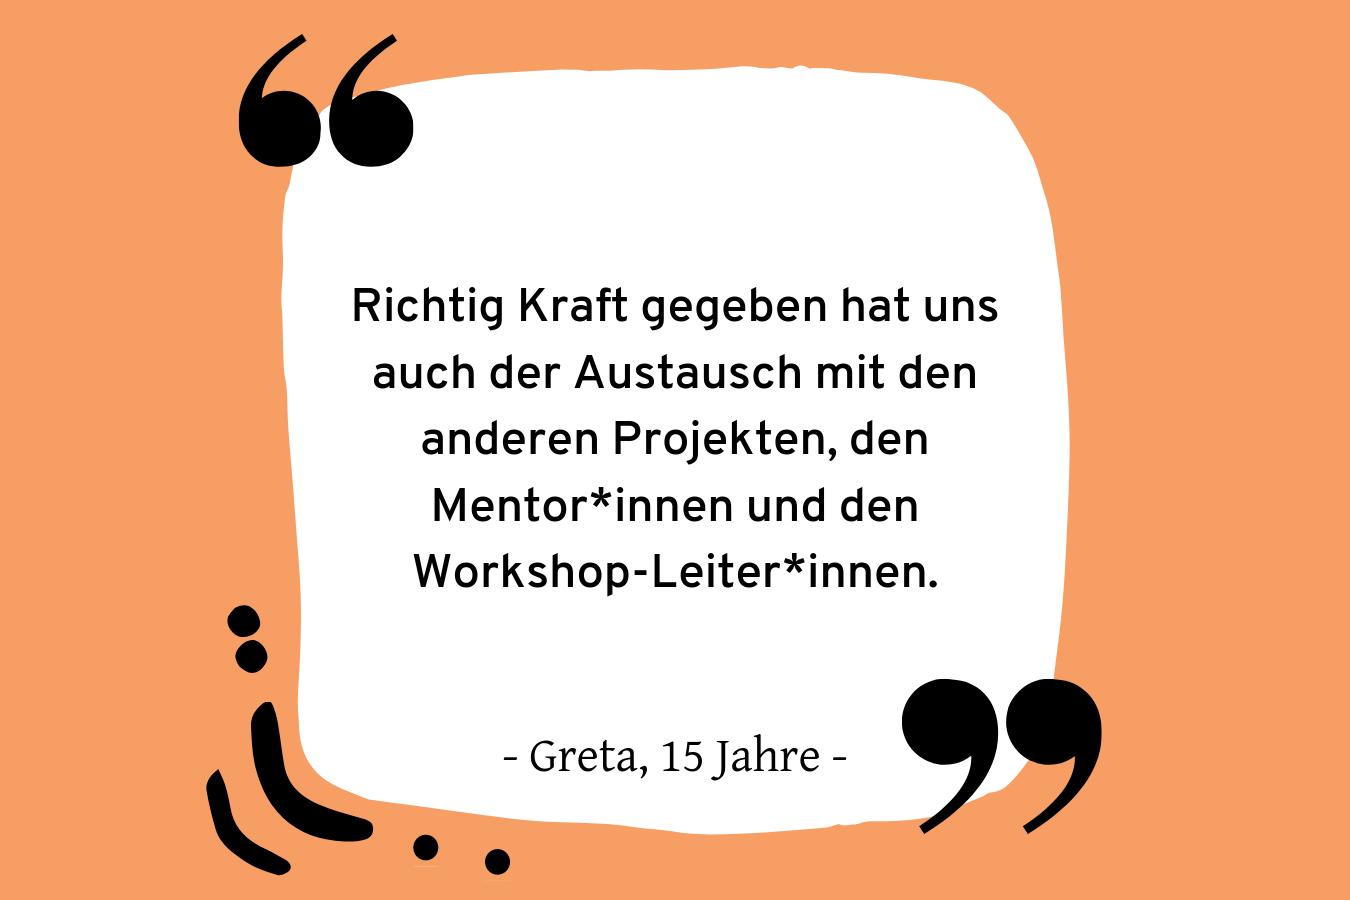 Zitat_Bildergalerie_Jugend_hilft!_Camp_2019 (25).png